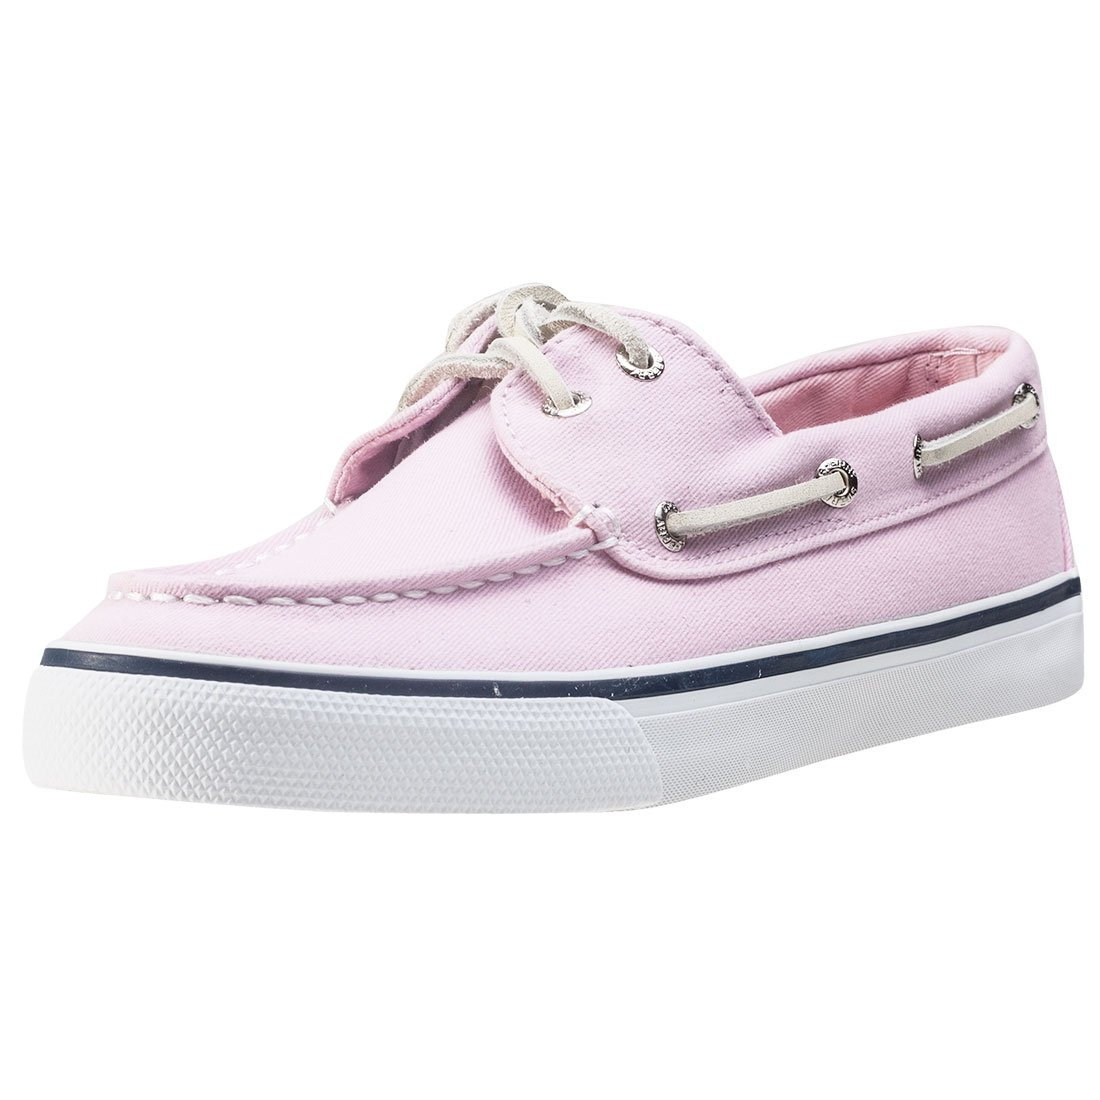 Sperry Top-Sider Women's Bahama Core Fashion Sneaker B008730TZ8 7 M (C)|Rose